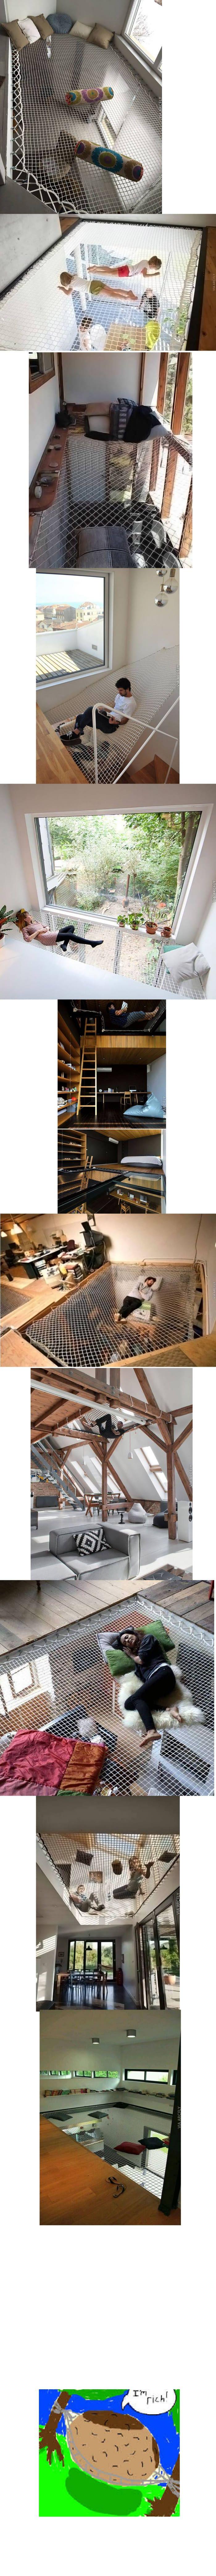 Best 25+ Hammock bed ideas on Pinterest | Homemade hammock ...